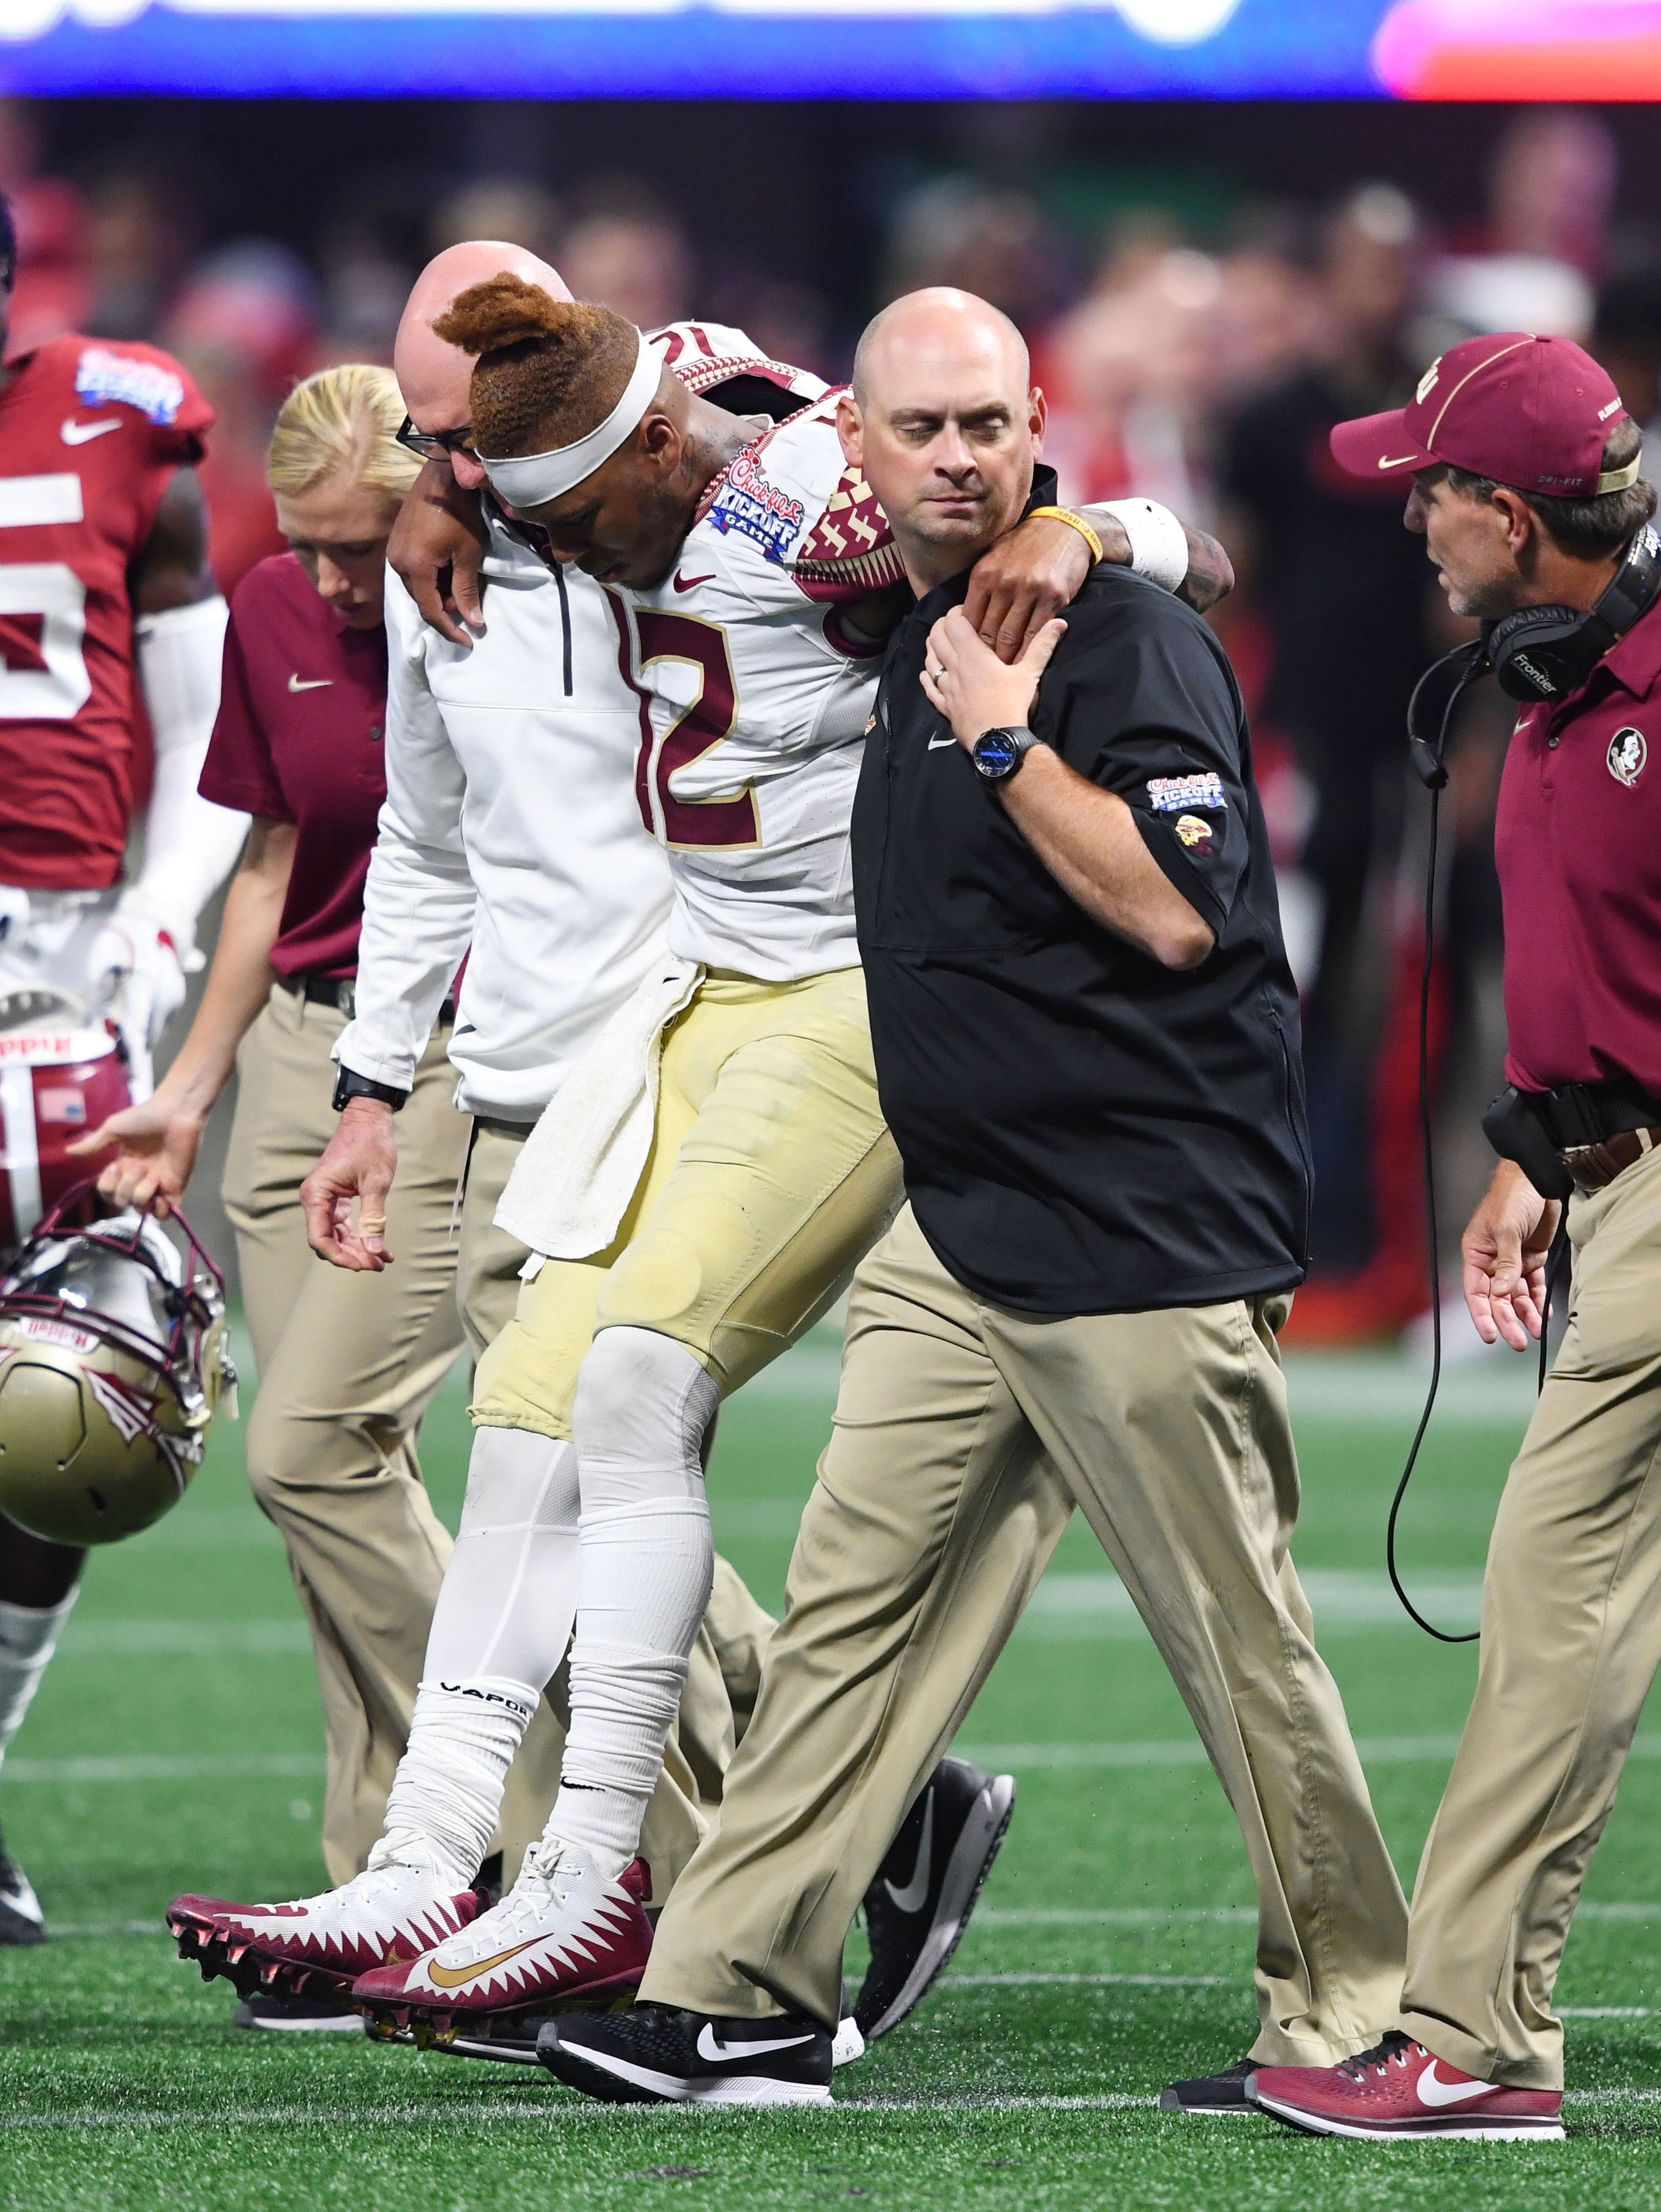 Florida State Apos S Season Could Turn On Deondre Francois Apos Injured Knee Seasons Turn Ons Fsu